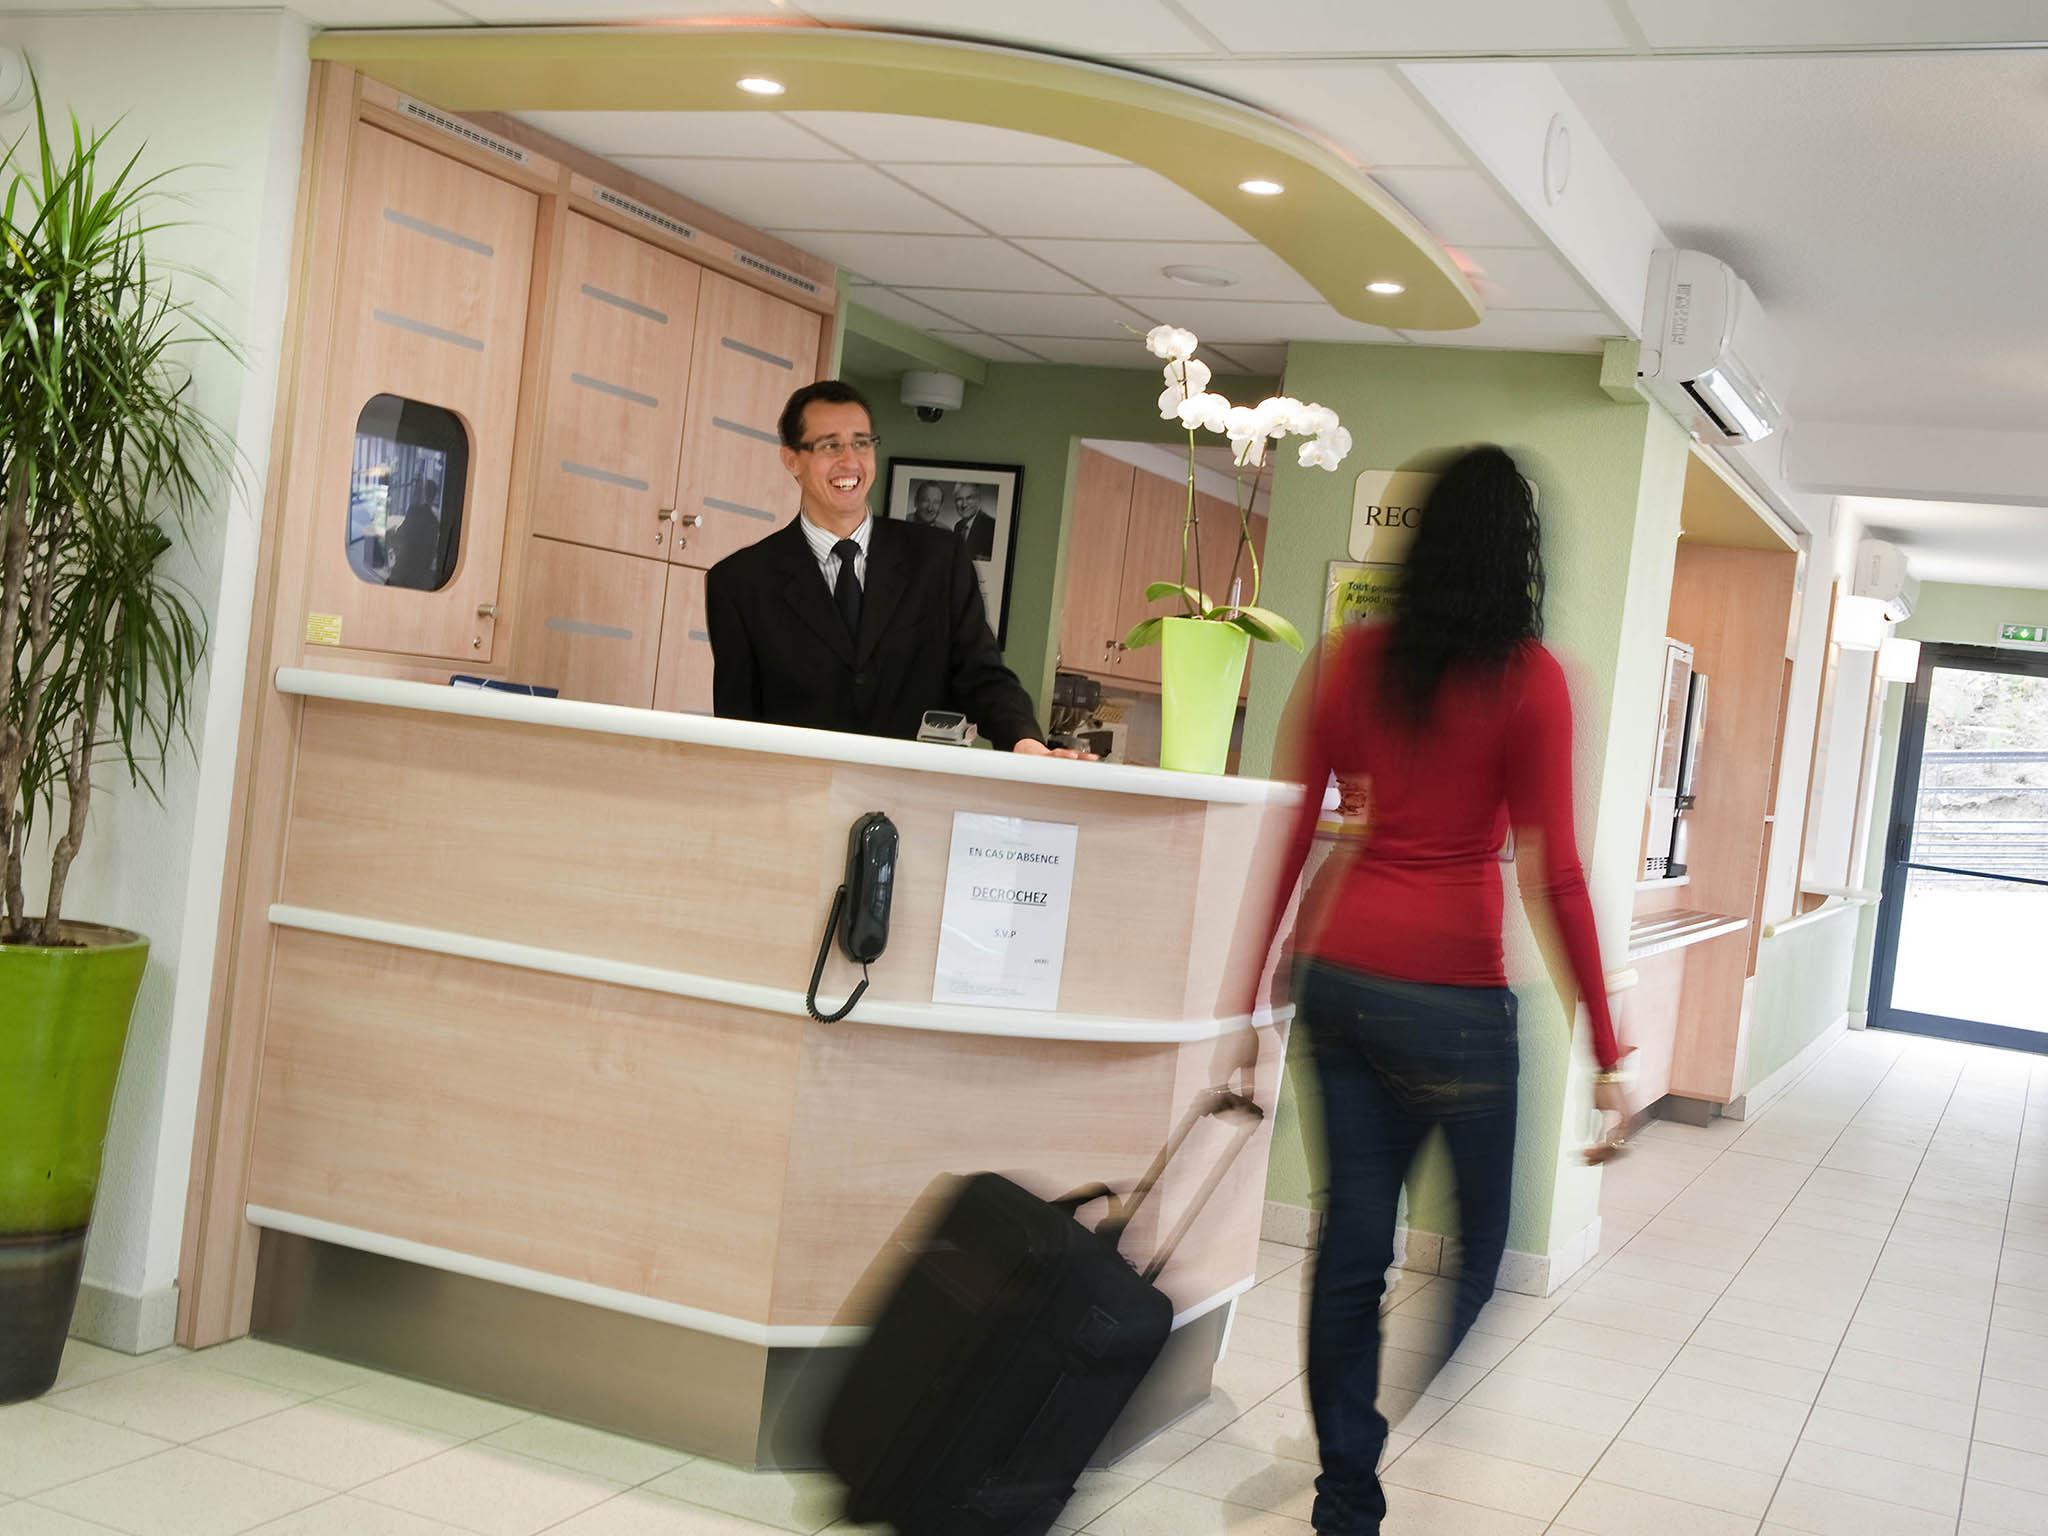 Hotel – ibis budget Cosne-sur-Loire